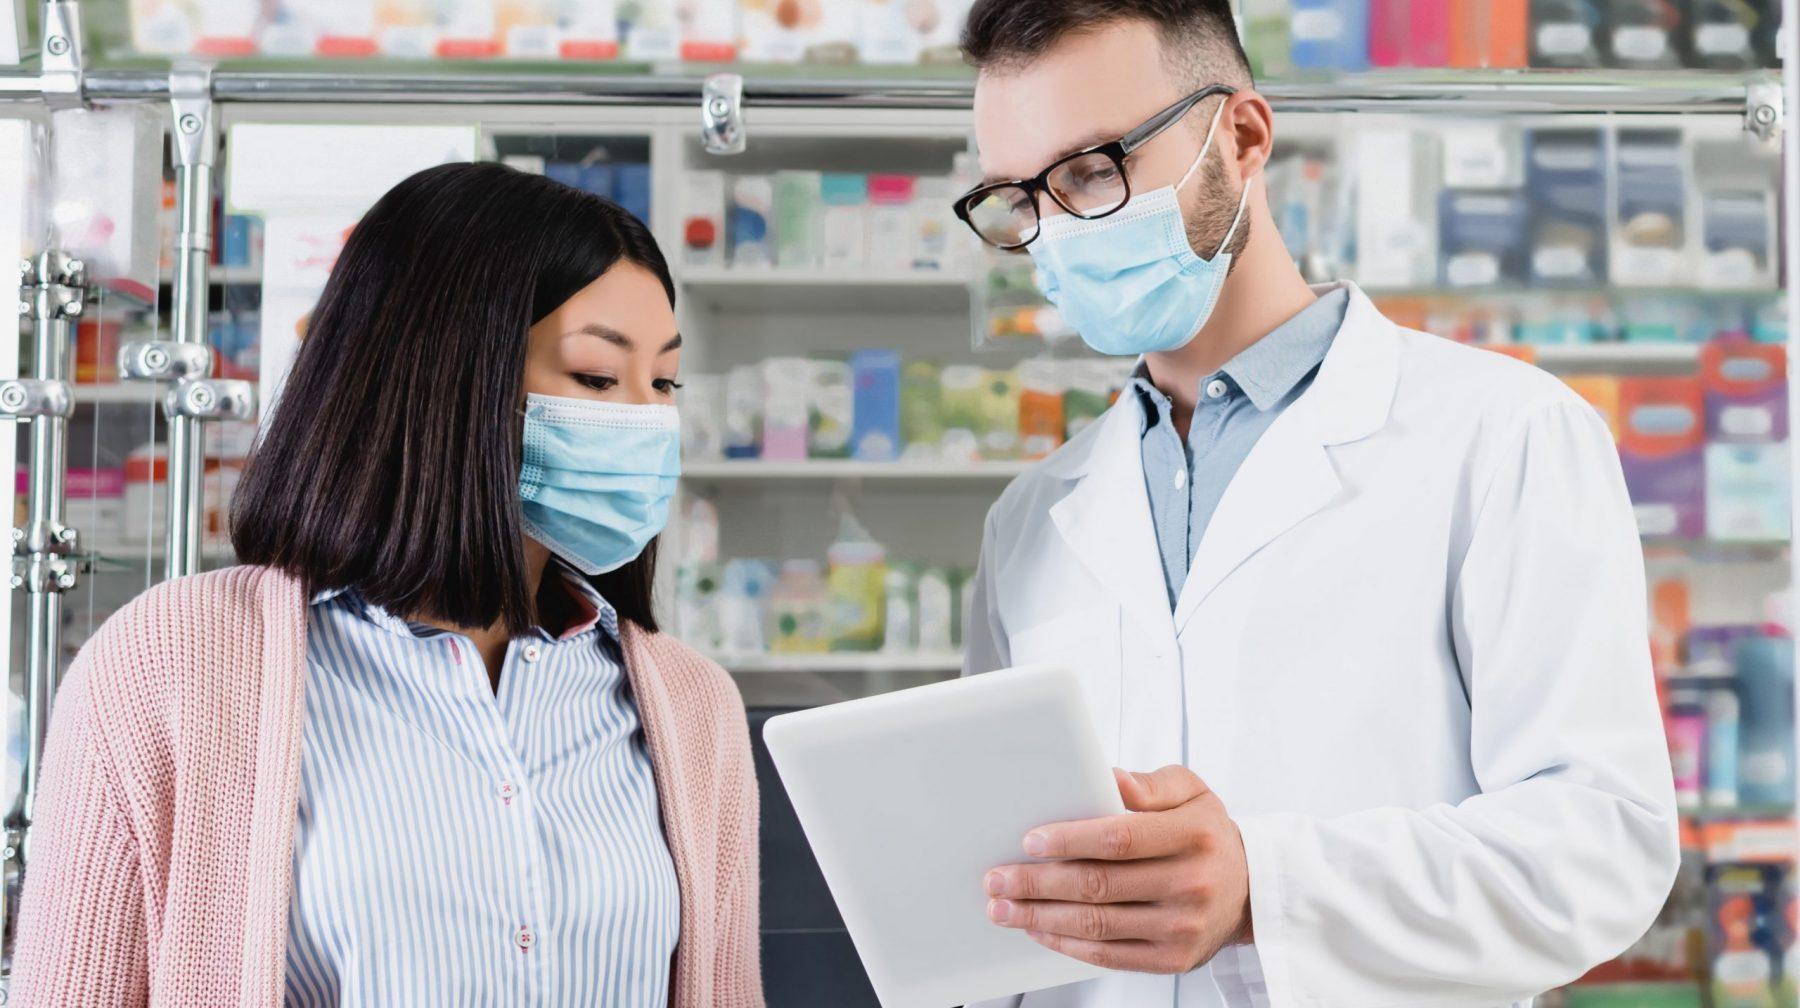 Pharmacist in eyeglasses and medical mask holding digital tablet near asian woman in drugstore, banner